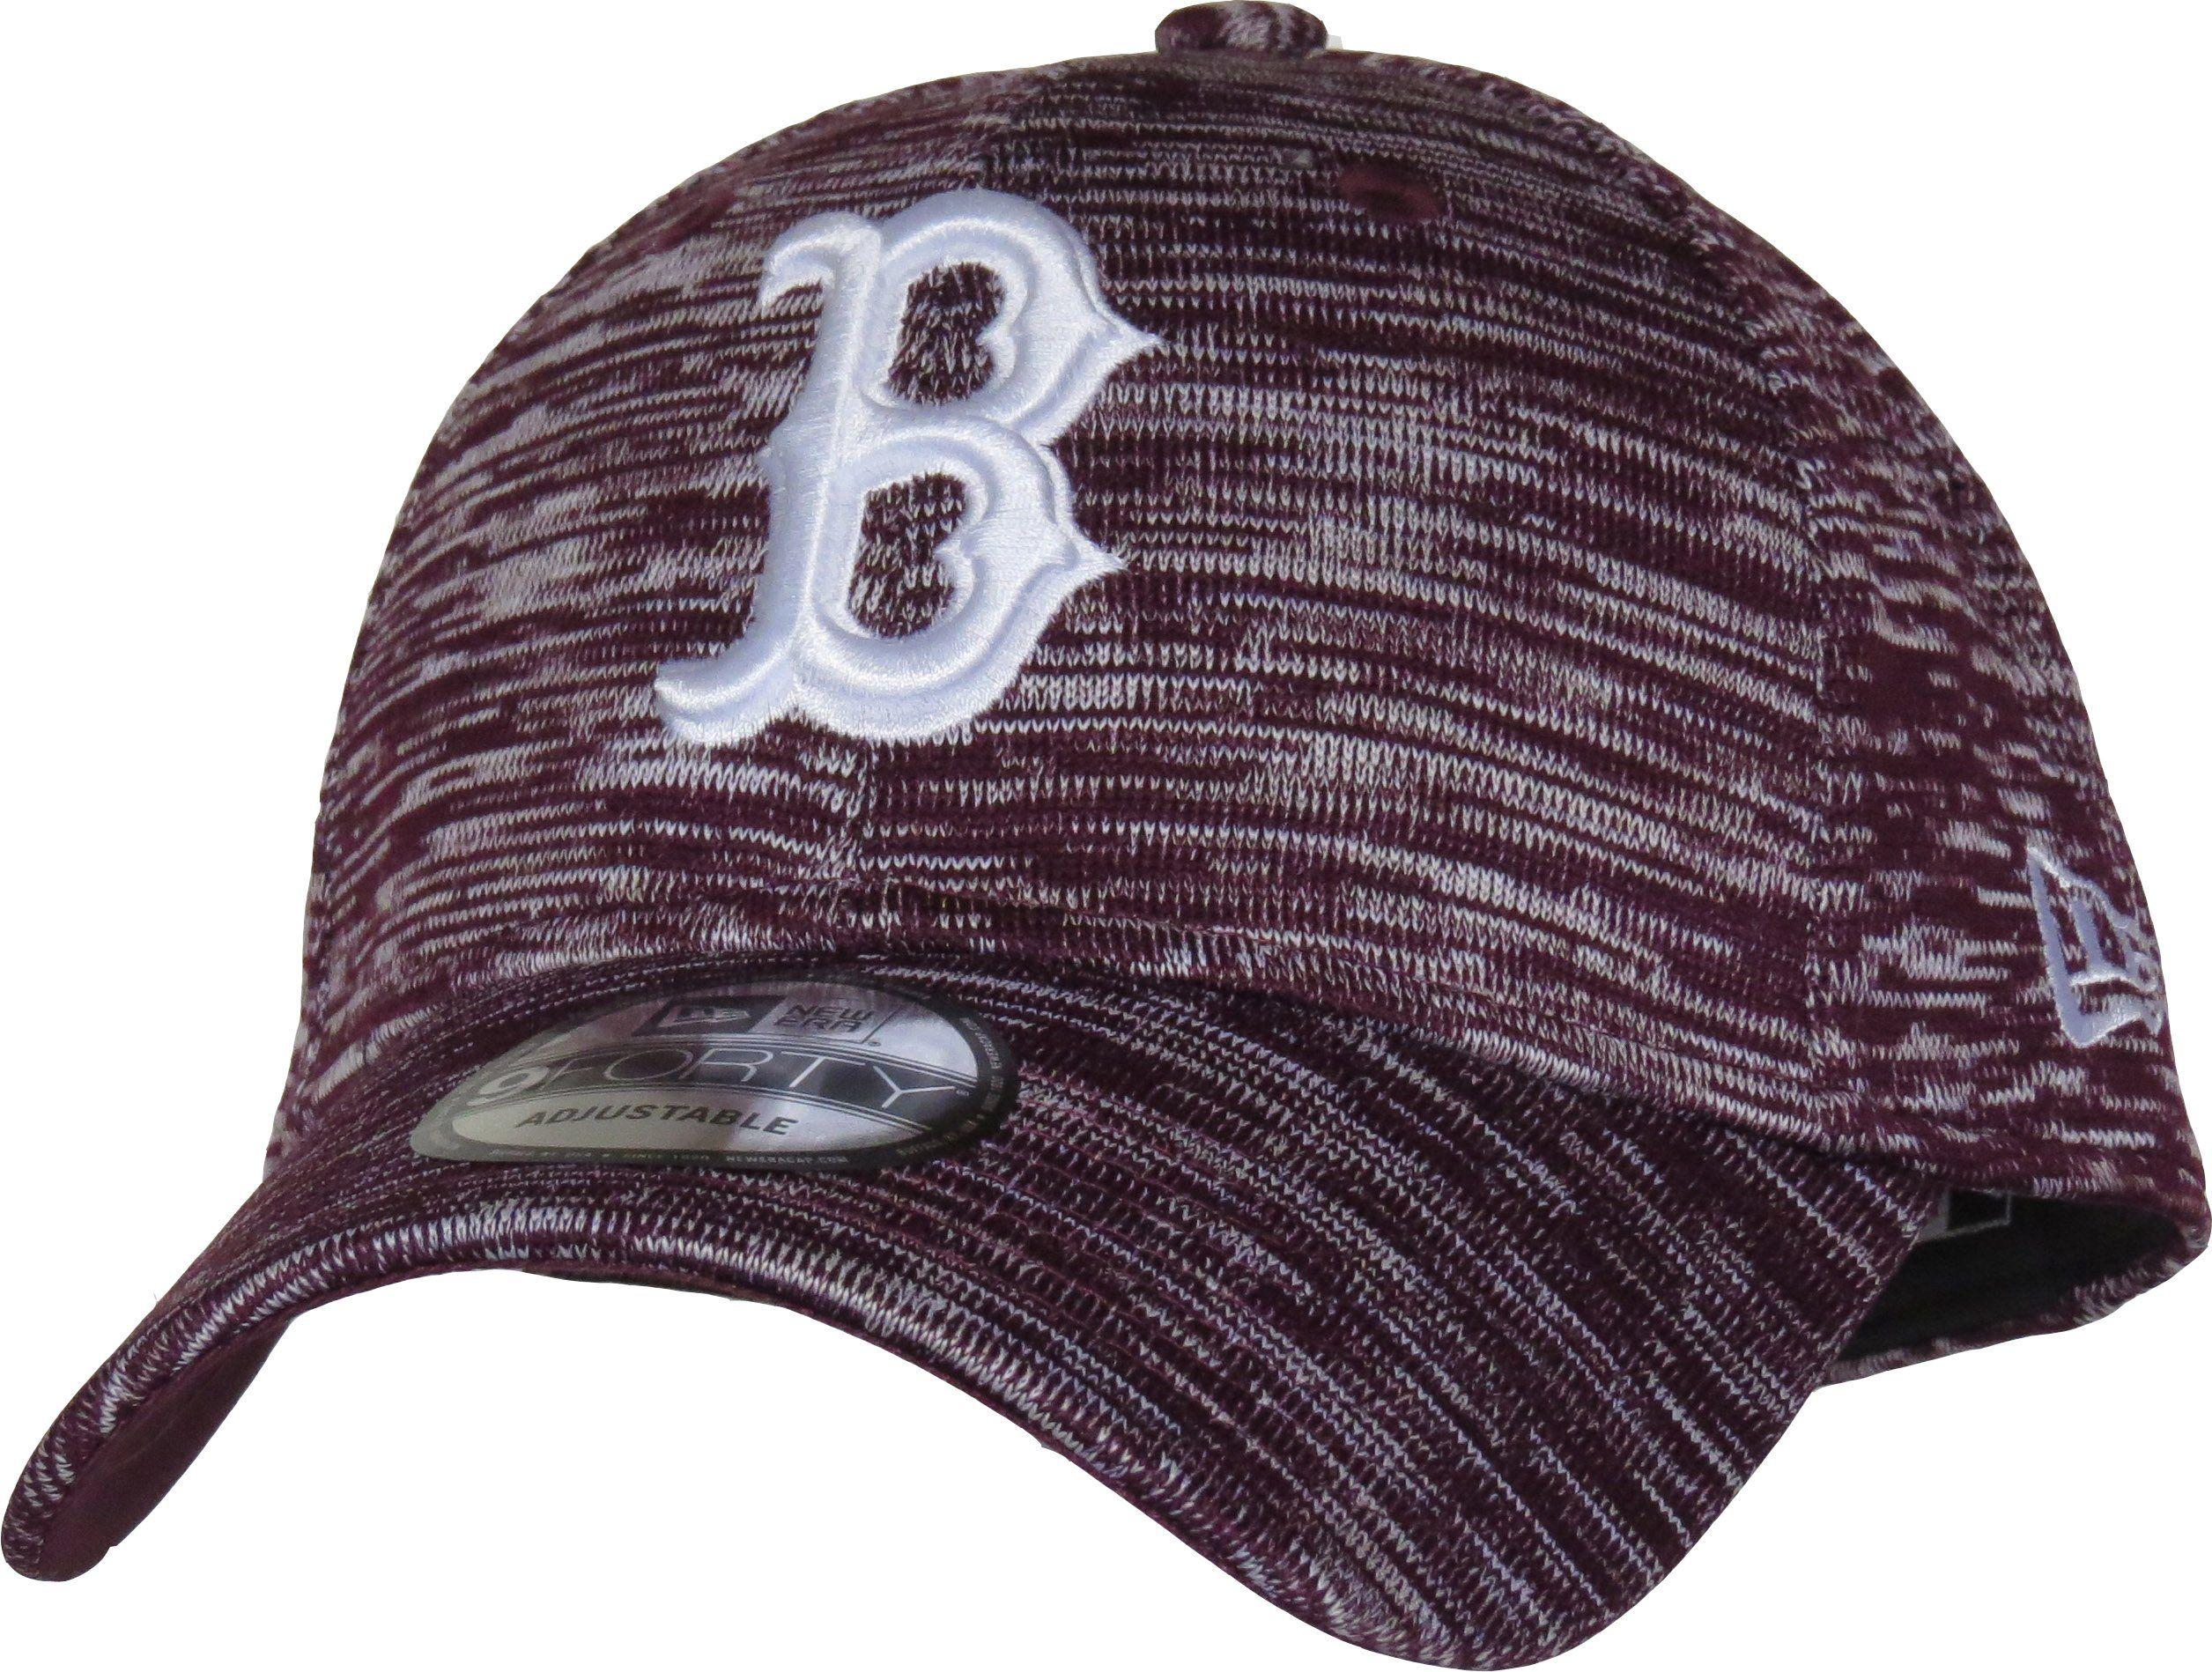 2ce722ab4c7 Boston Red Sox New Era 940 Engineered Fit Maroon Baseball Cap – lovemycap